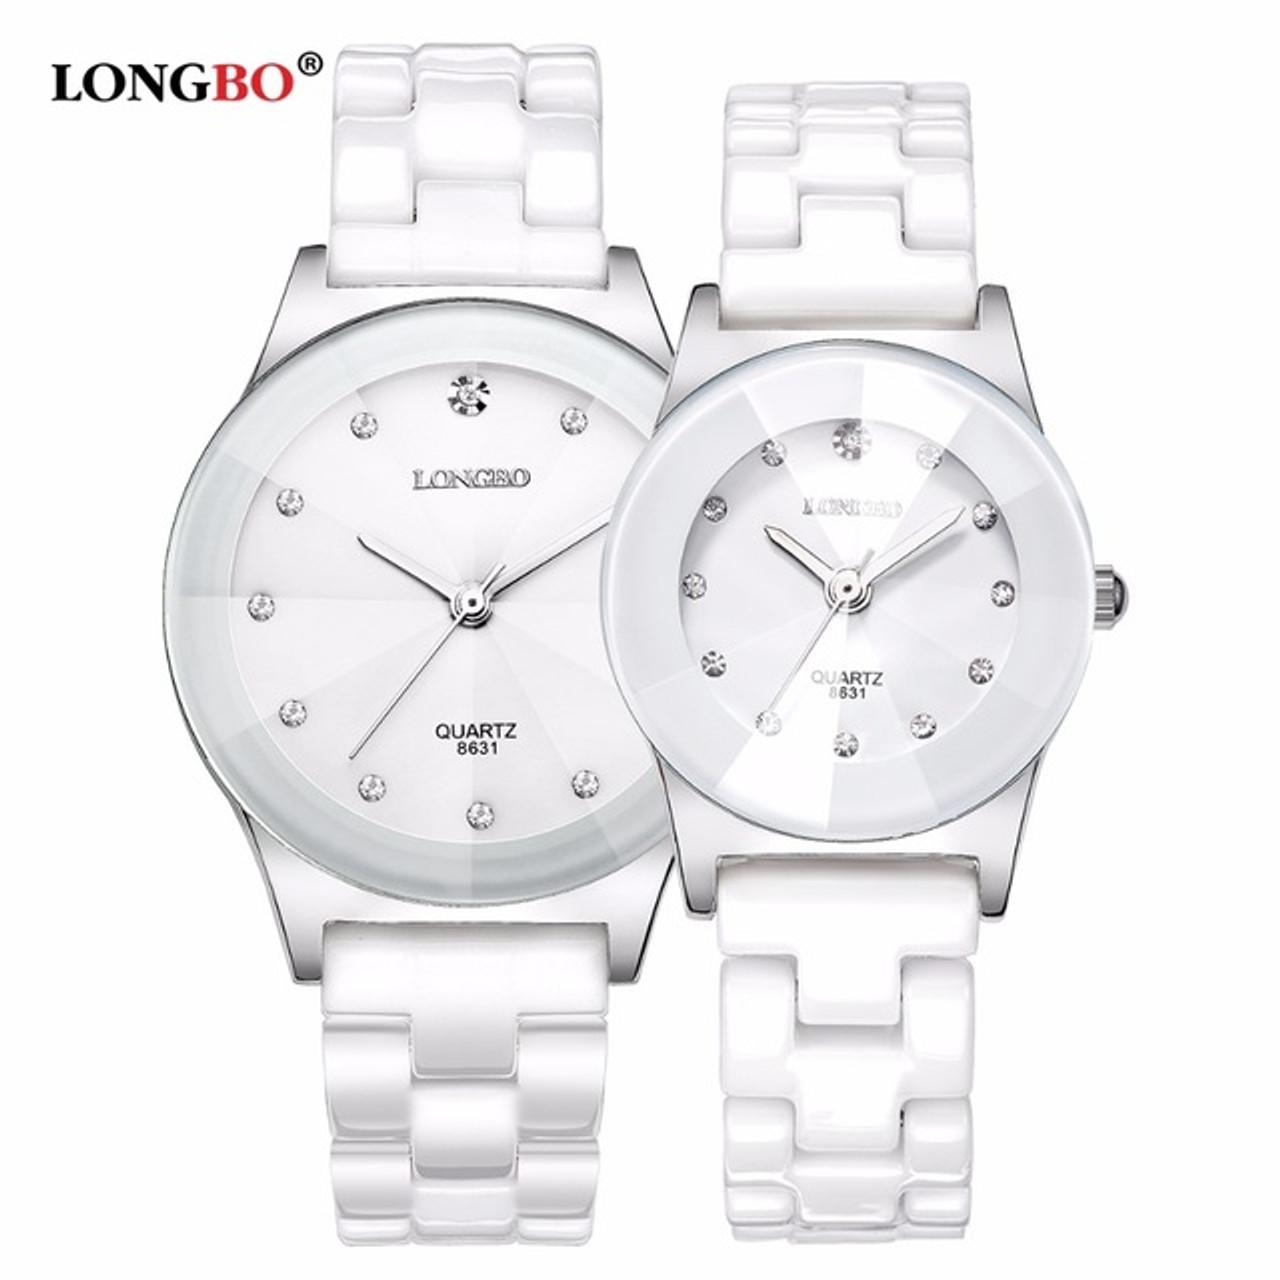 585891b4cf9 2018 LONGBO Top Brand Fashion Quartz White Ceramic Lovers Watches Luxury  Casual Unique Ladies Dress Wristwatch ...